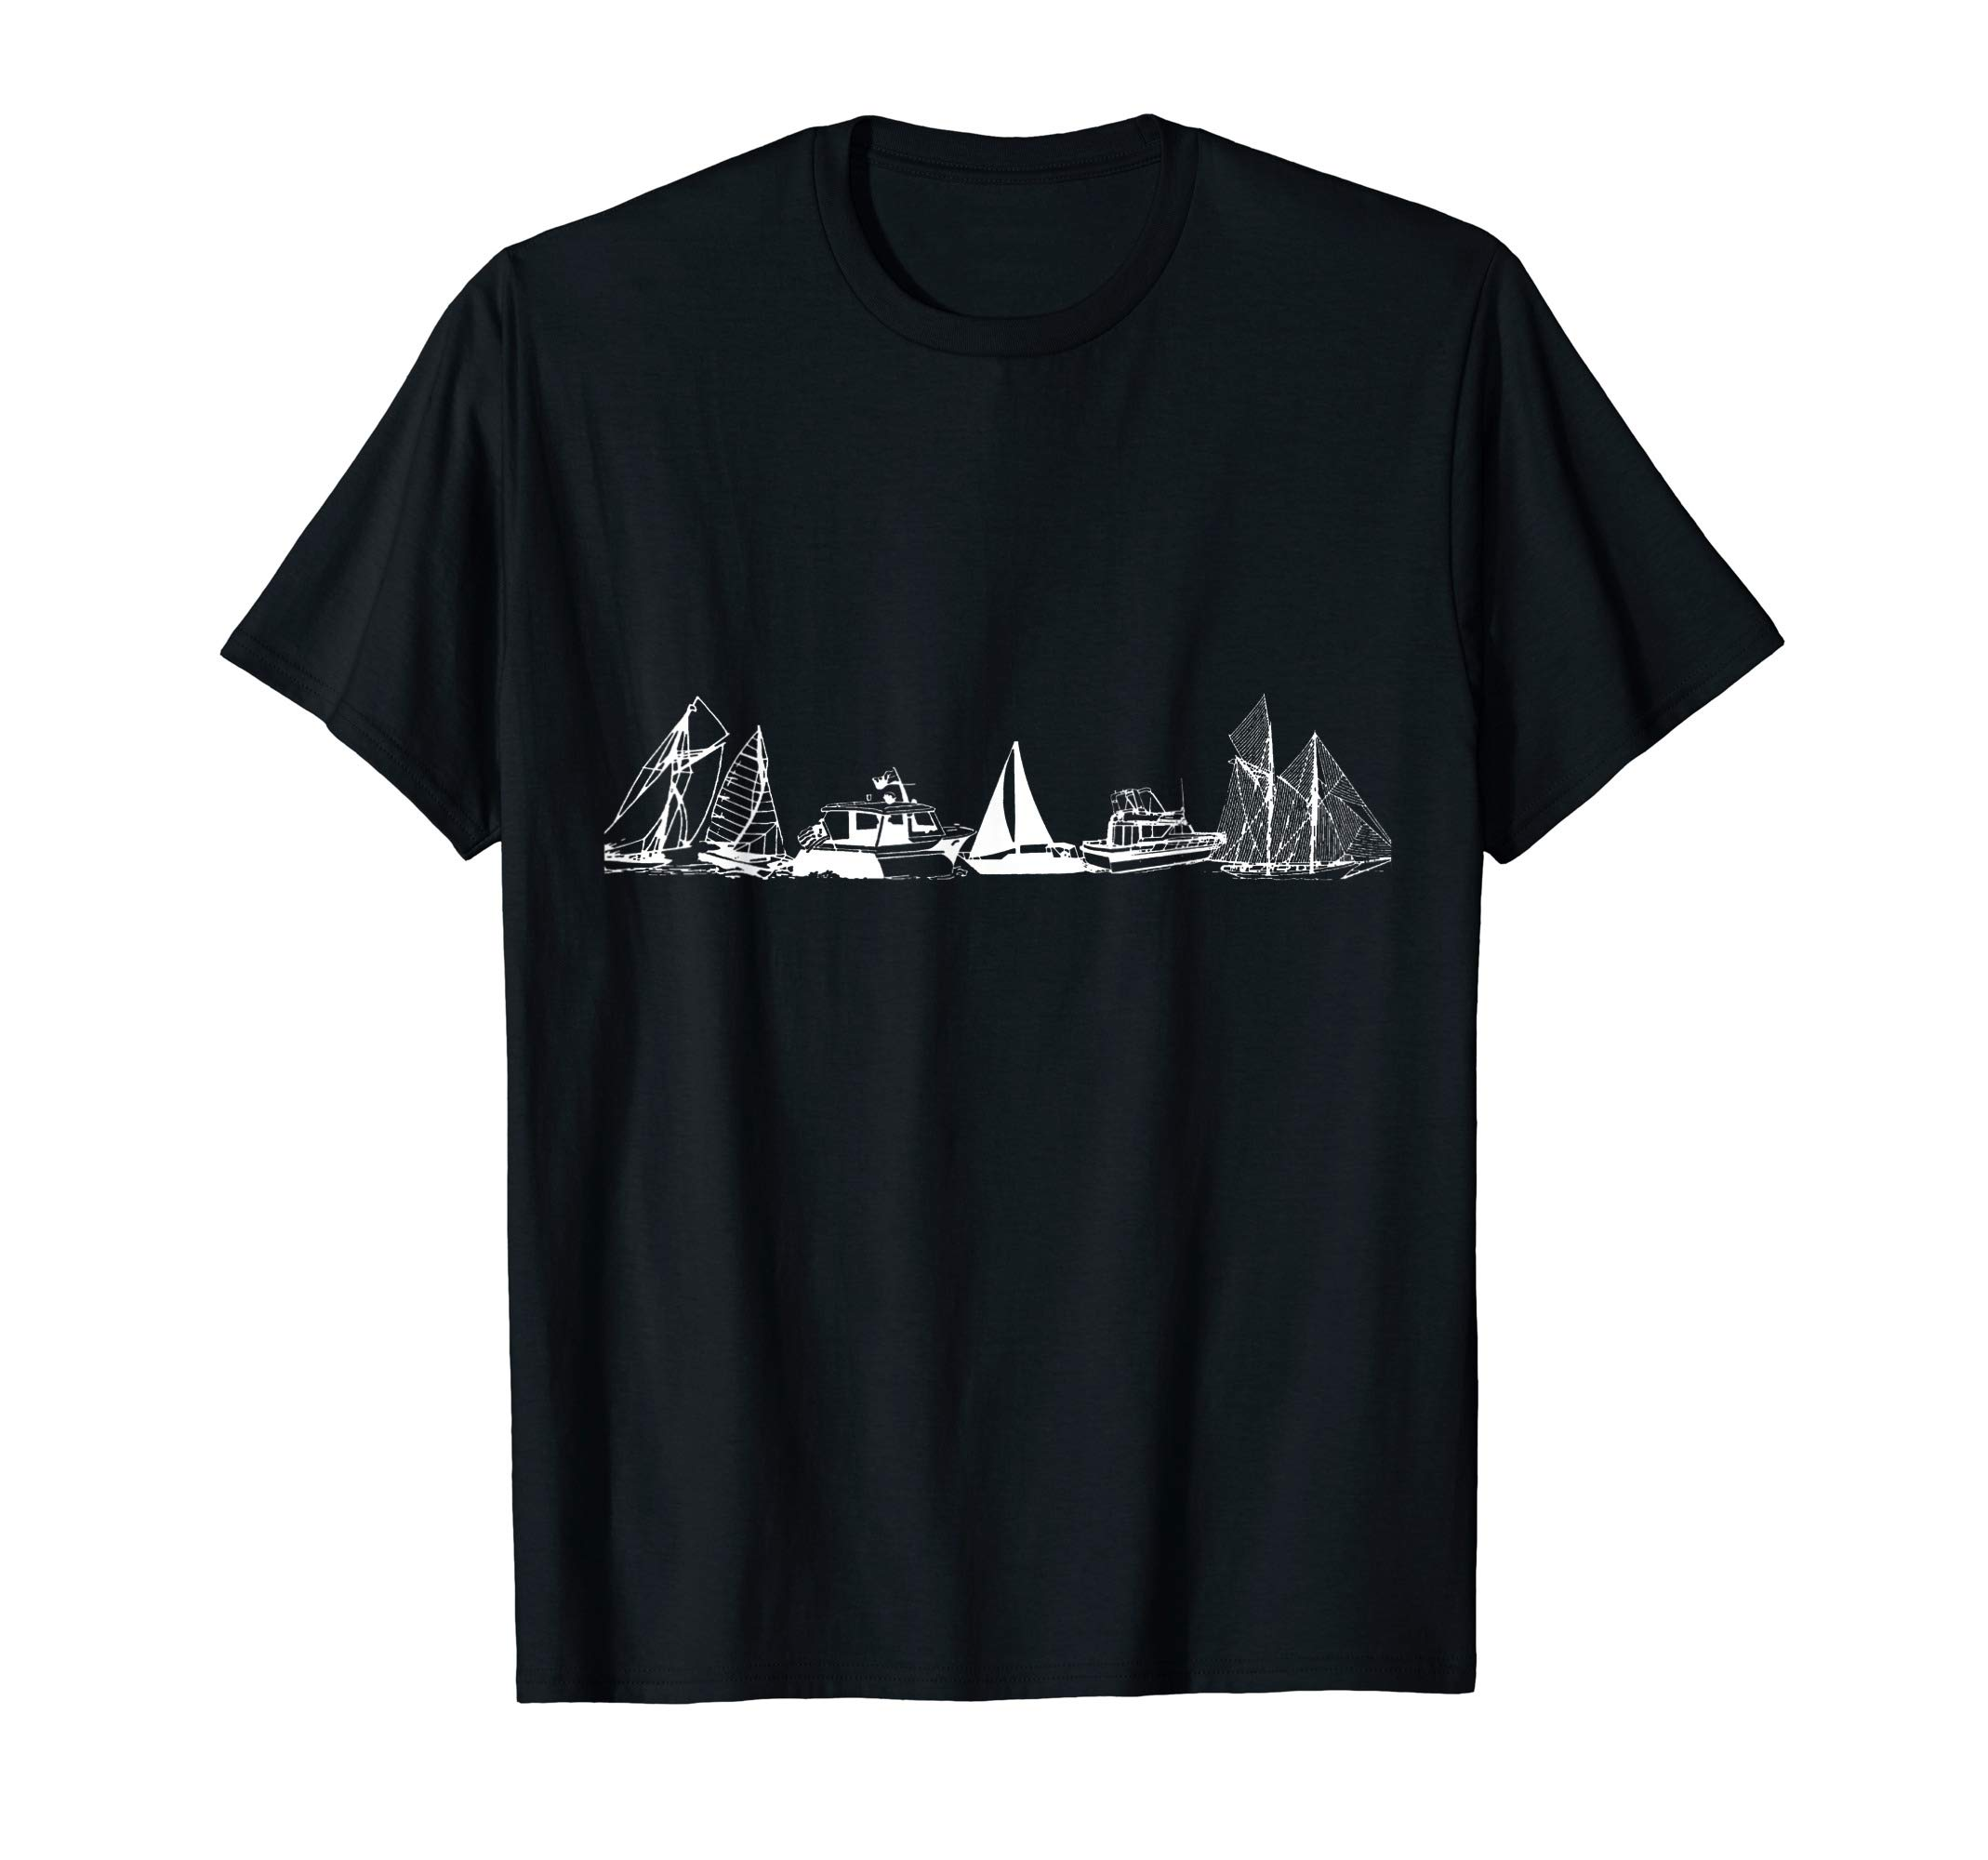 Sailing or Motor Boating  T-Shirt by Sailing and Motor Boating Co